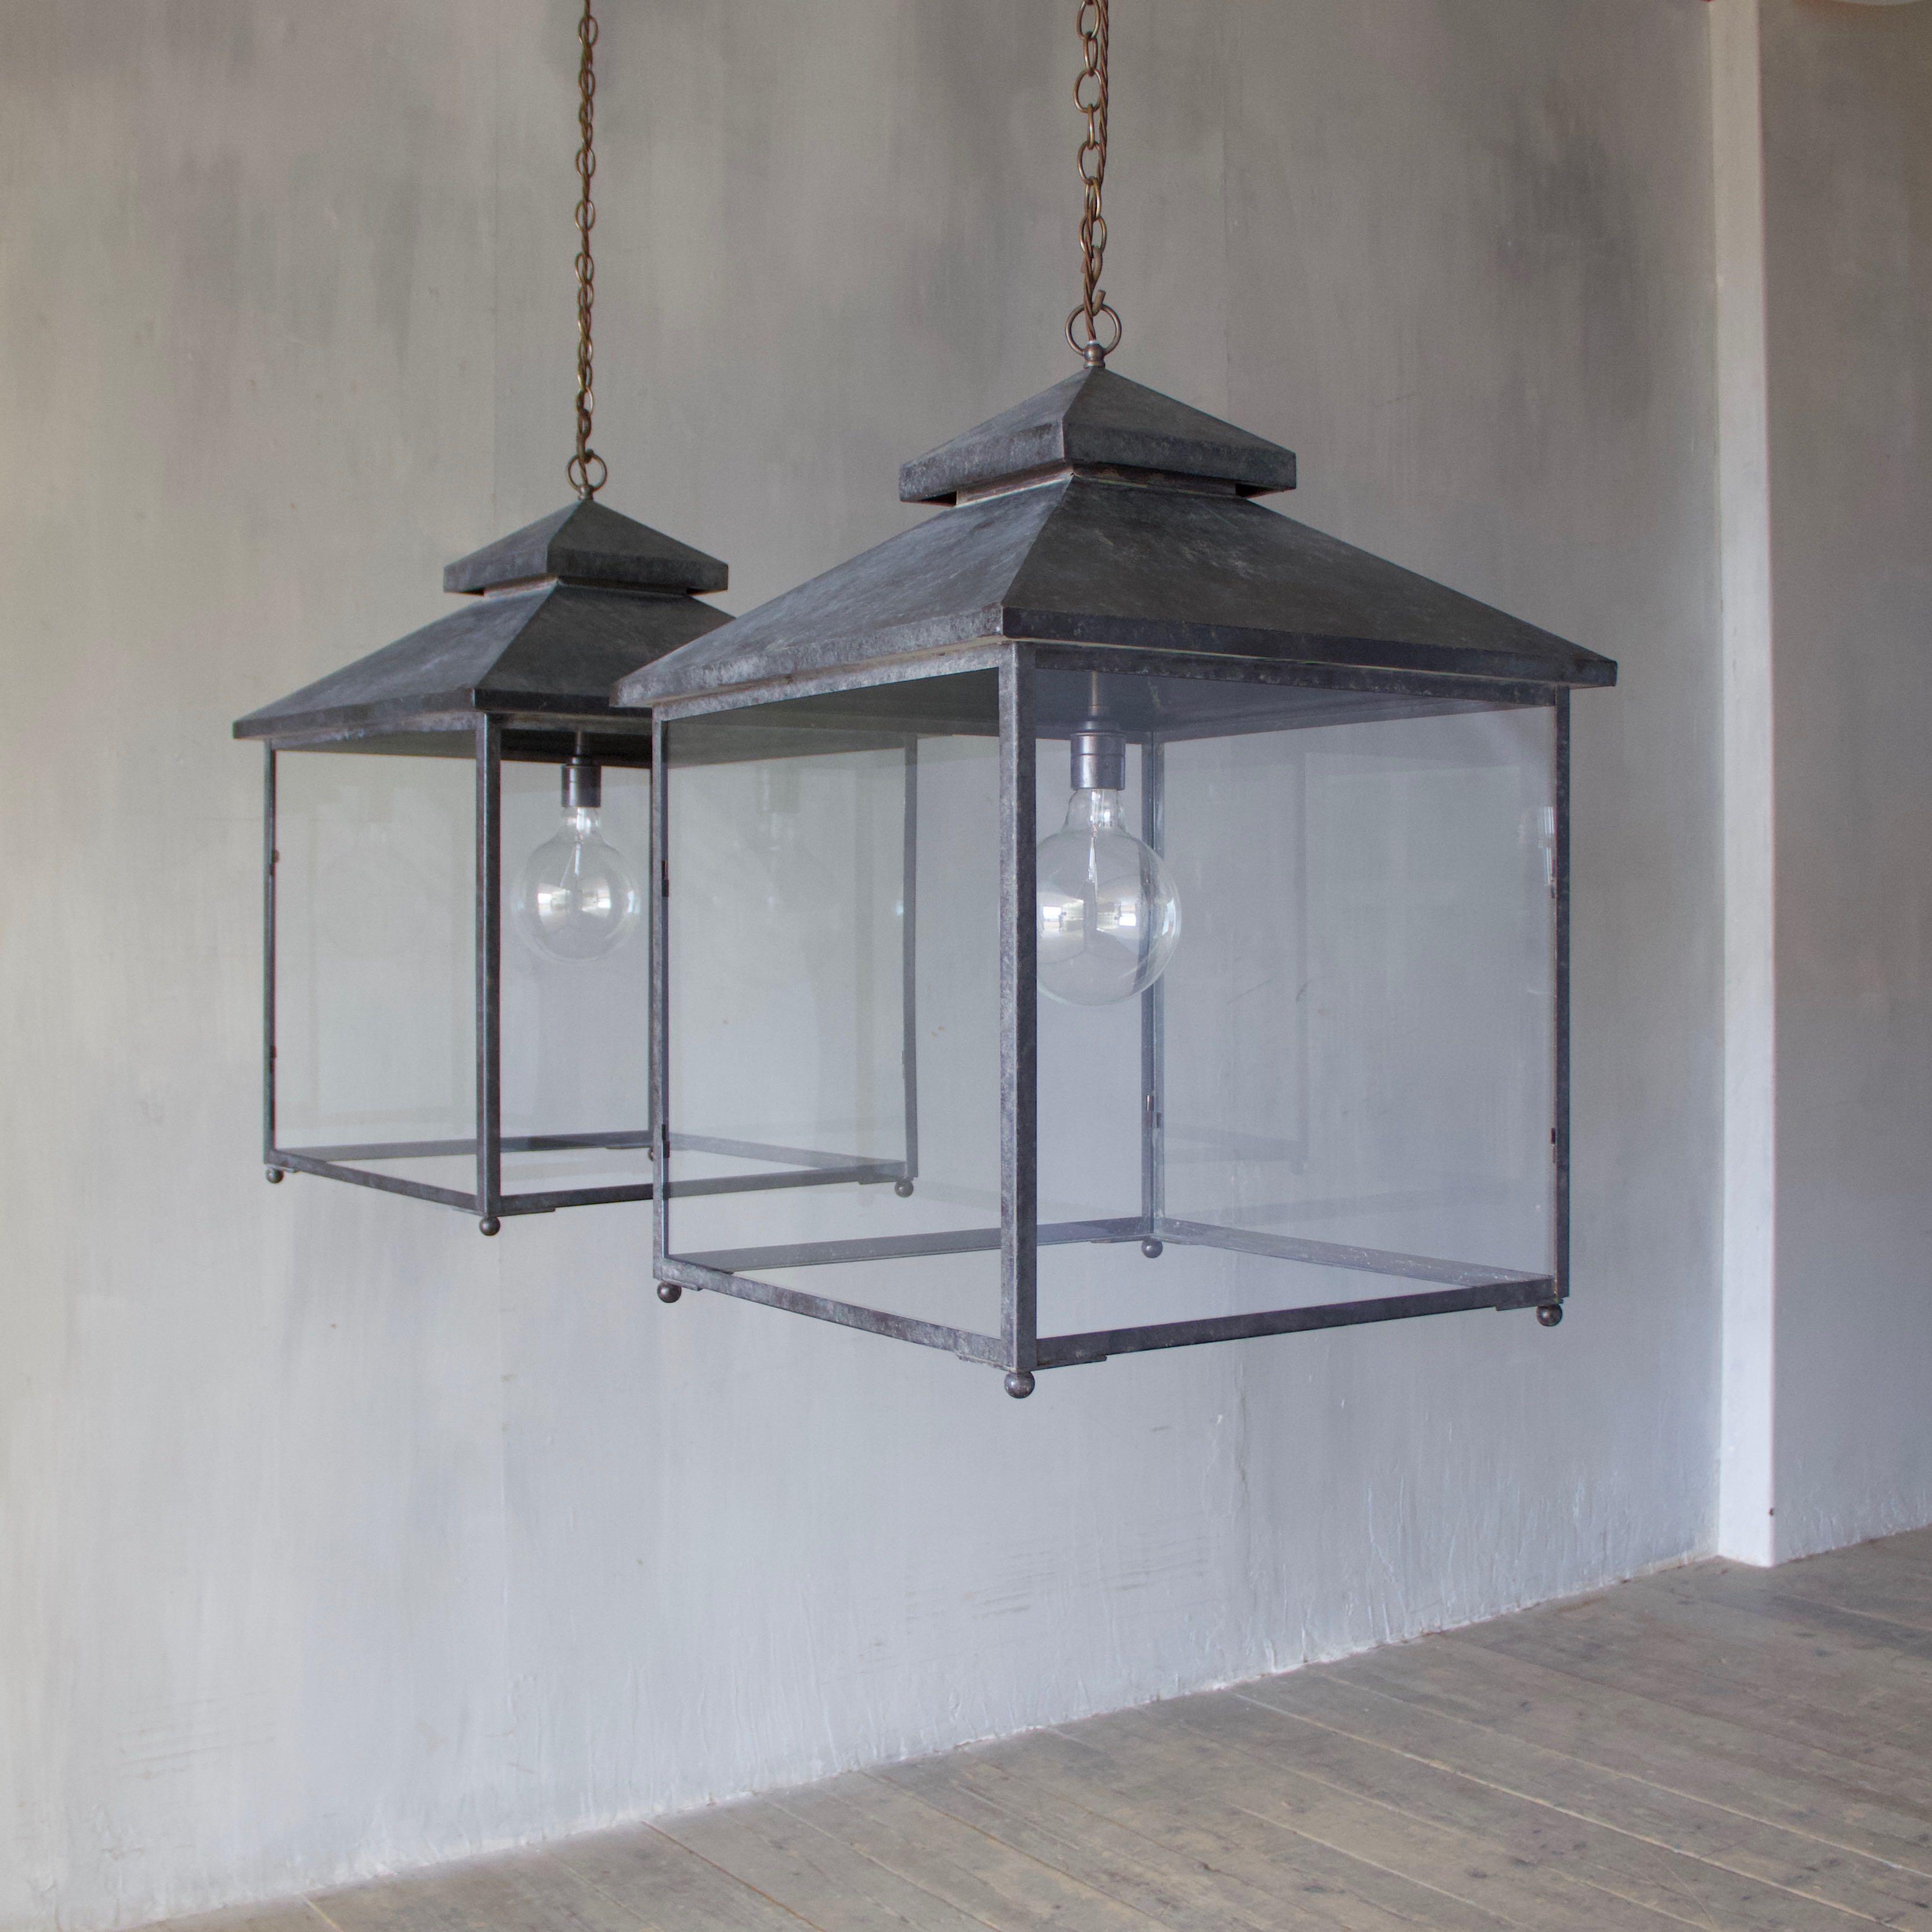 Galley lantern | Matthew Cox | Square